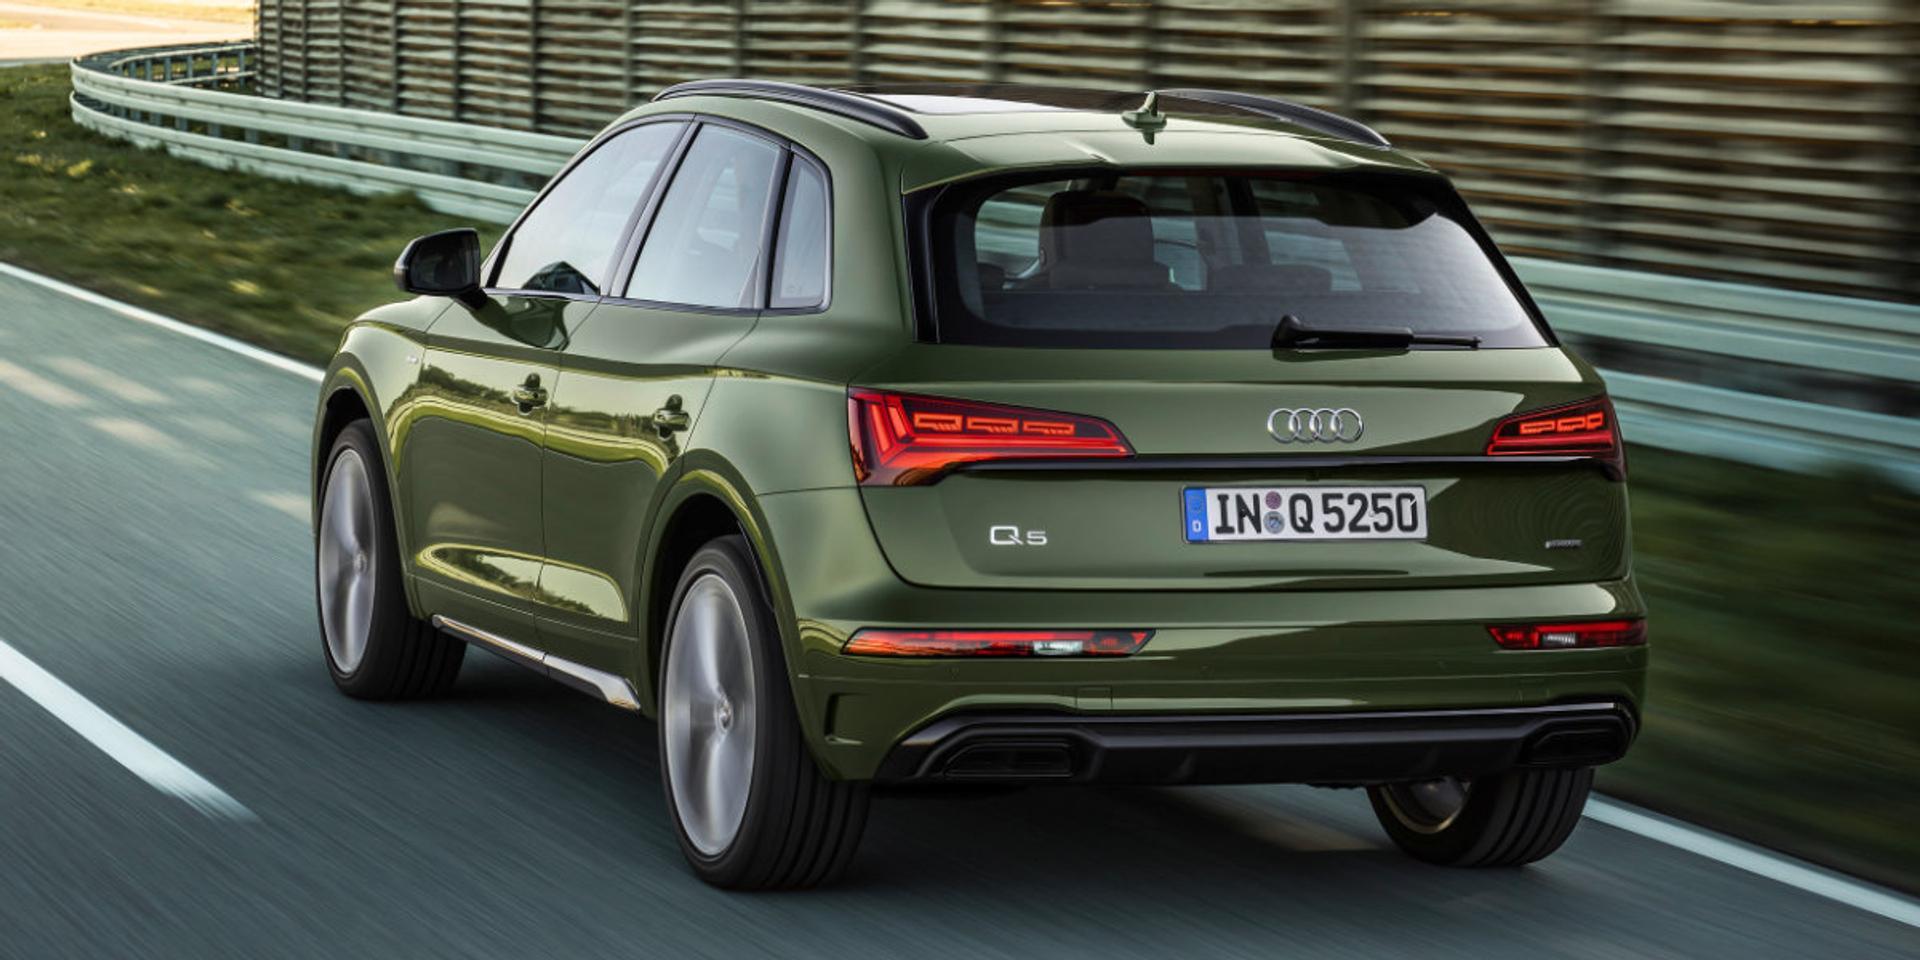 Audi Q5 rear view